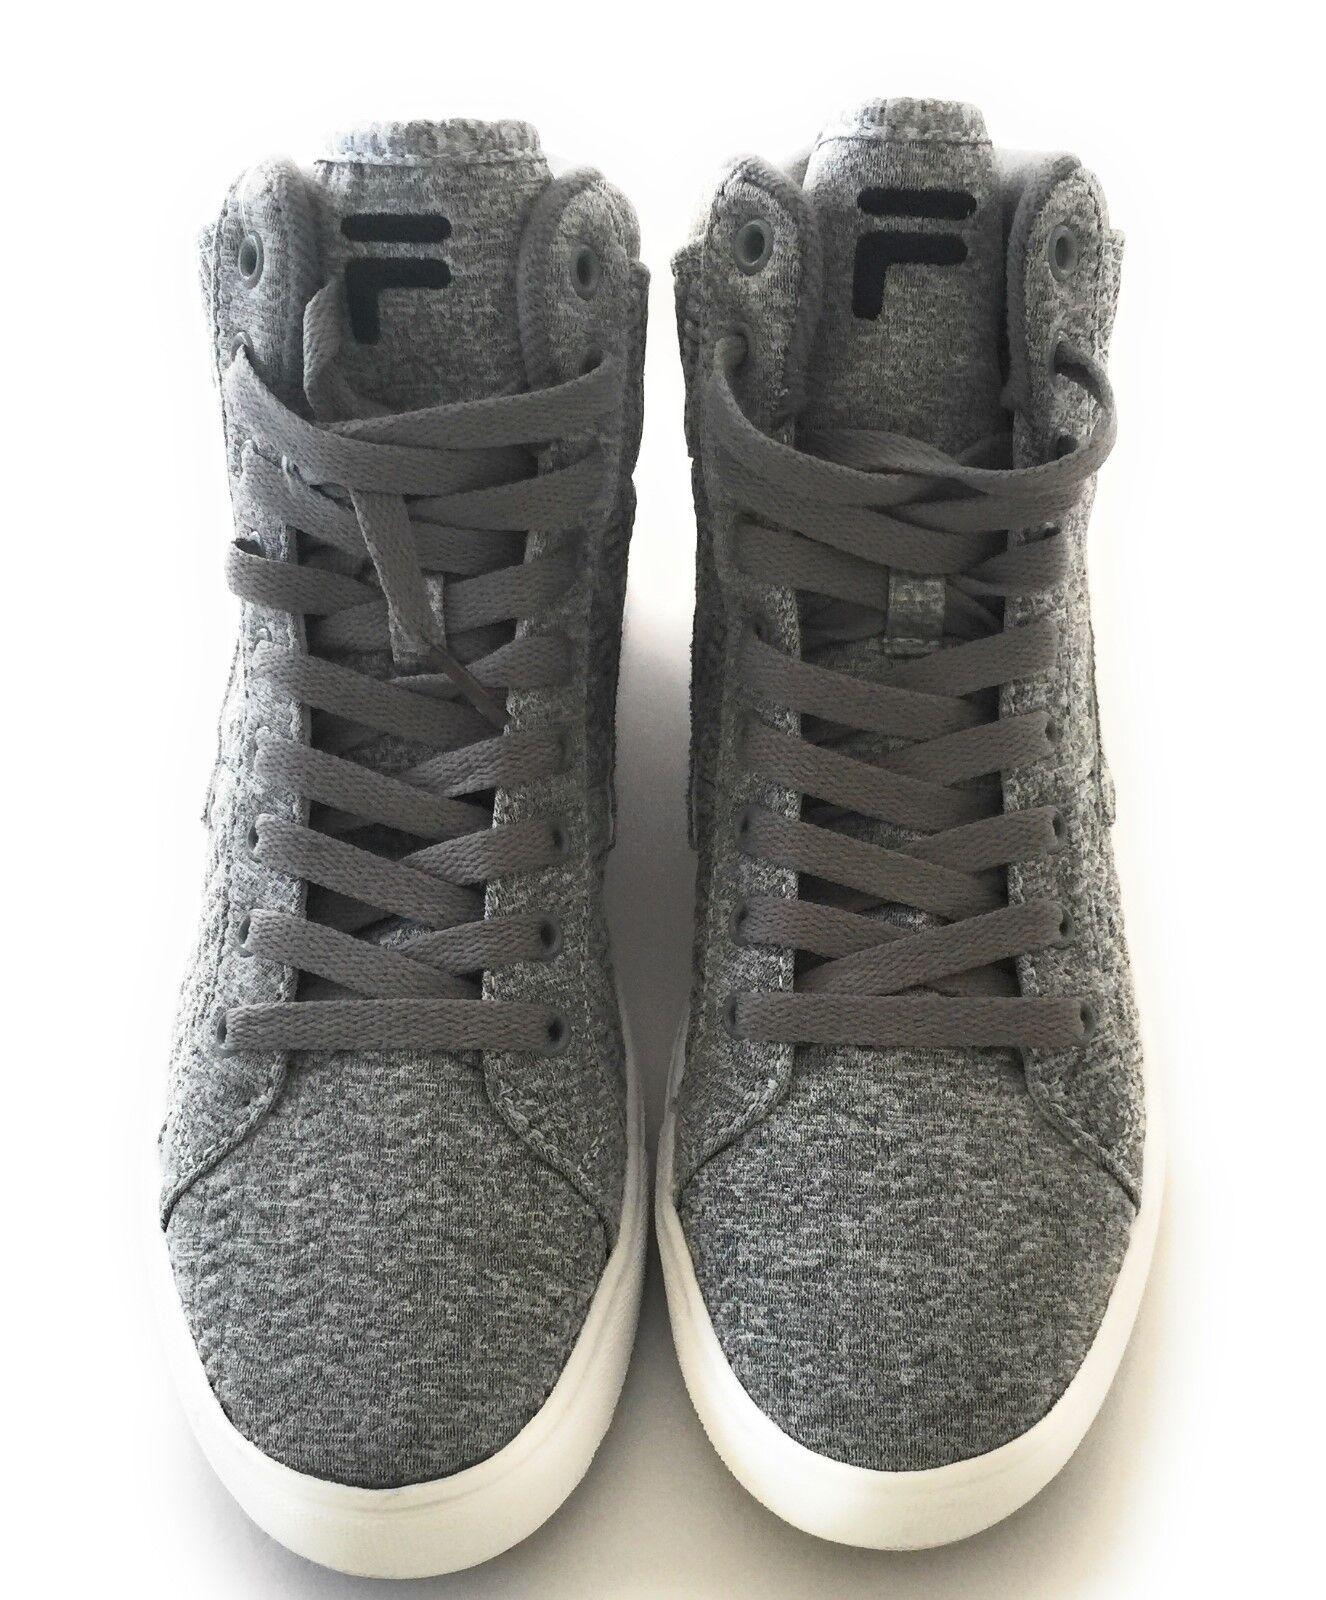 Fila Women's Smokescreen 2 Casual Shoe free shipping best-selling model of the brand